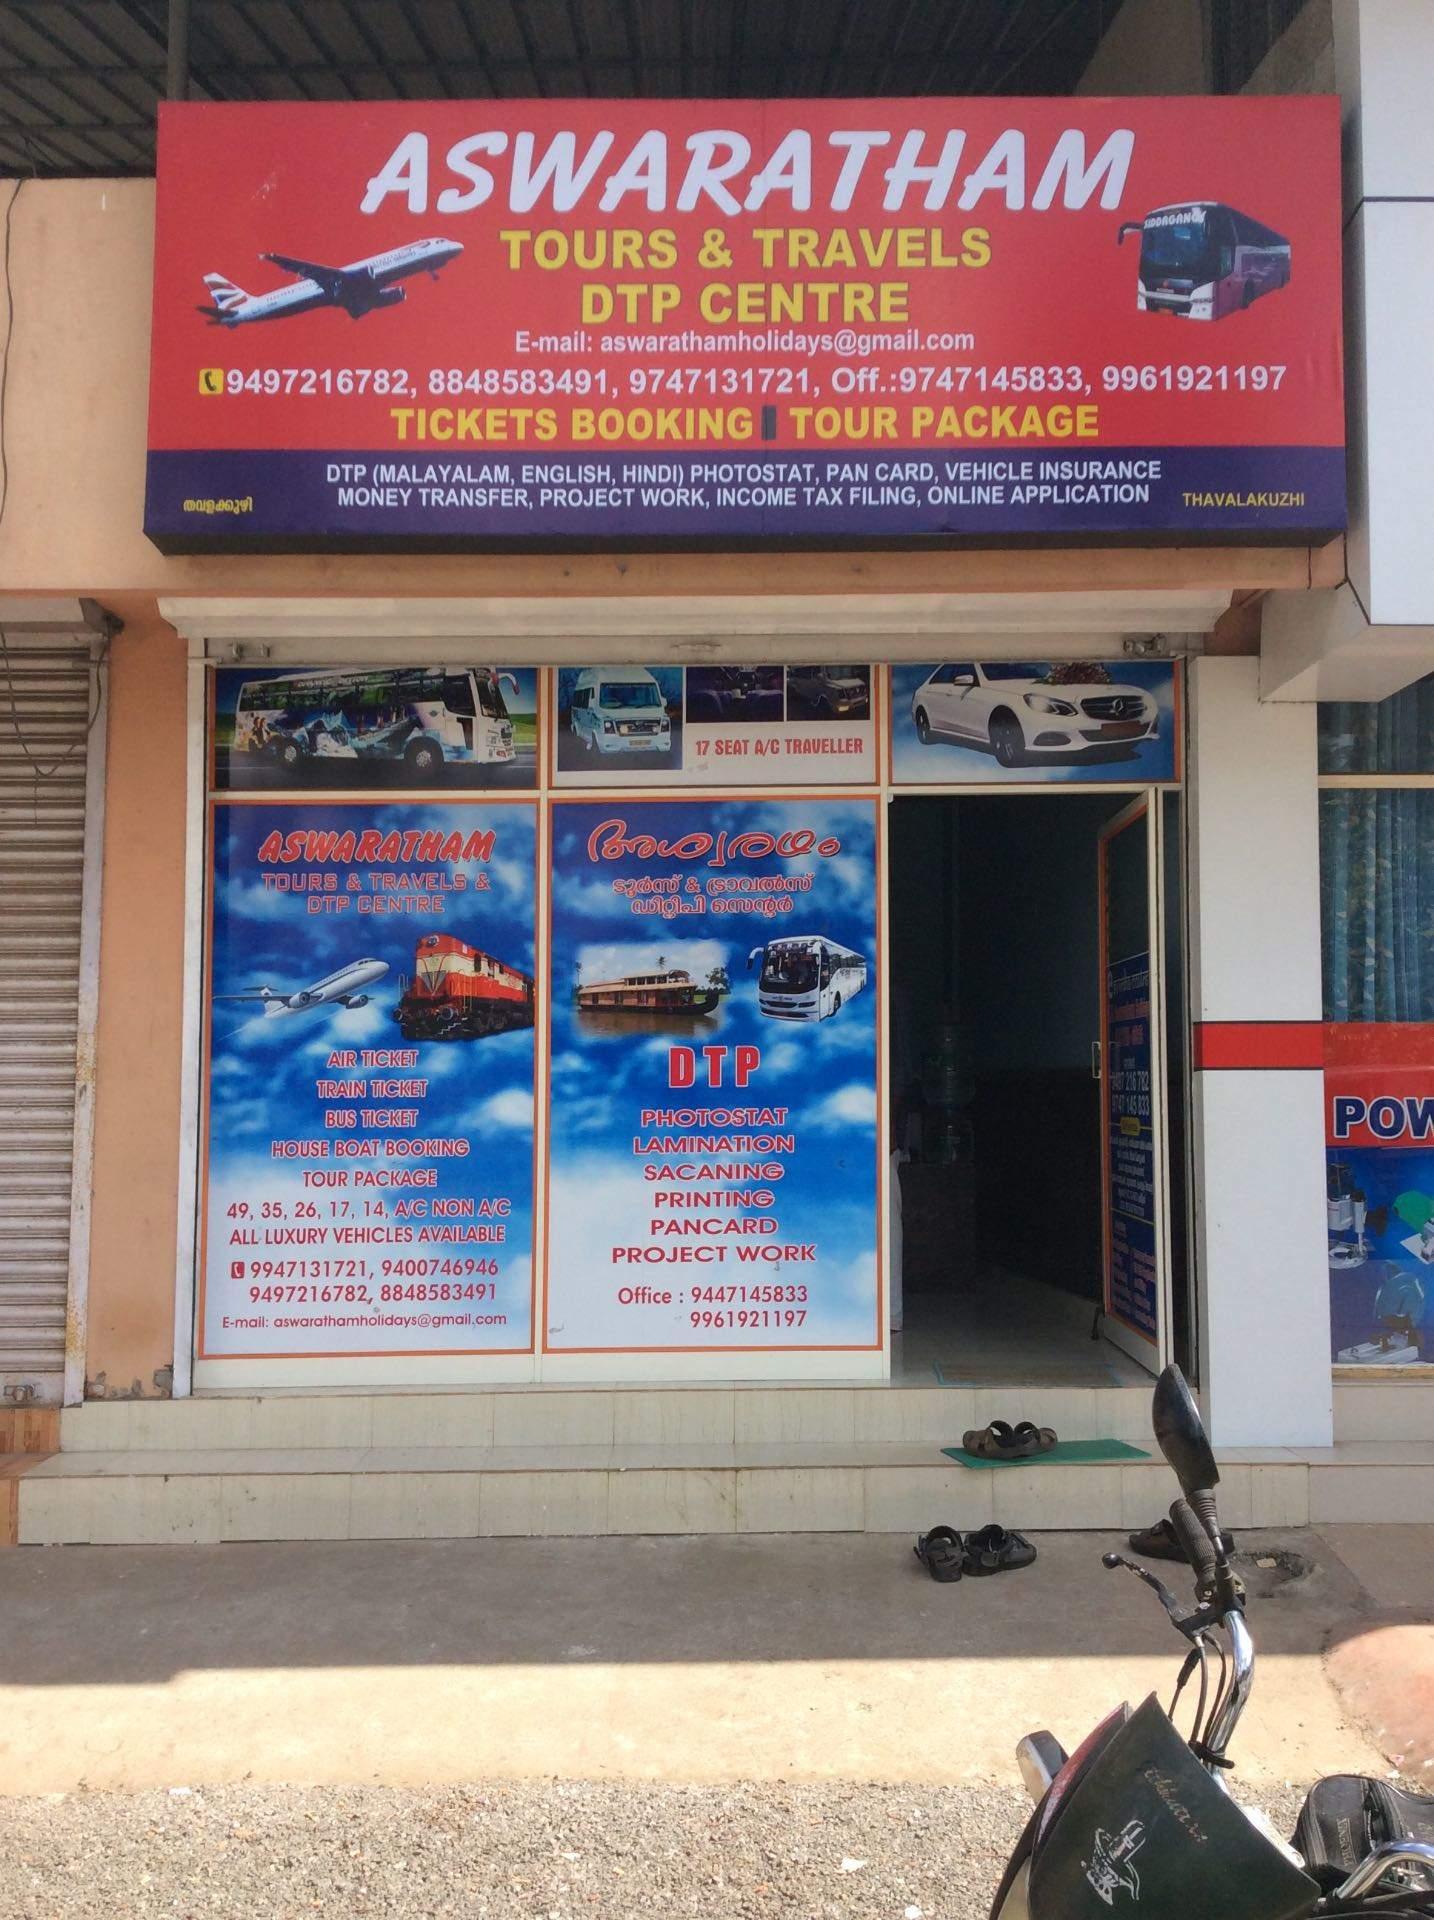 Honeymoon Package around Kottayam - Best Destination Honeymoon Tour